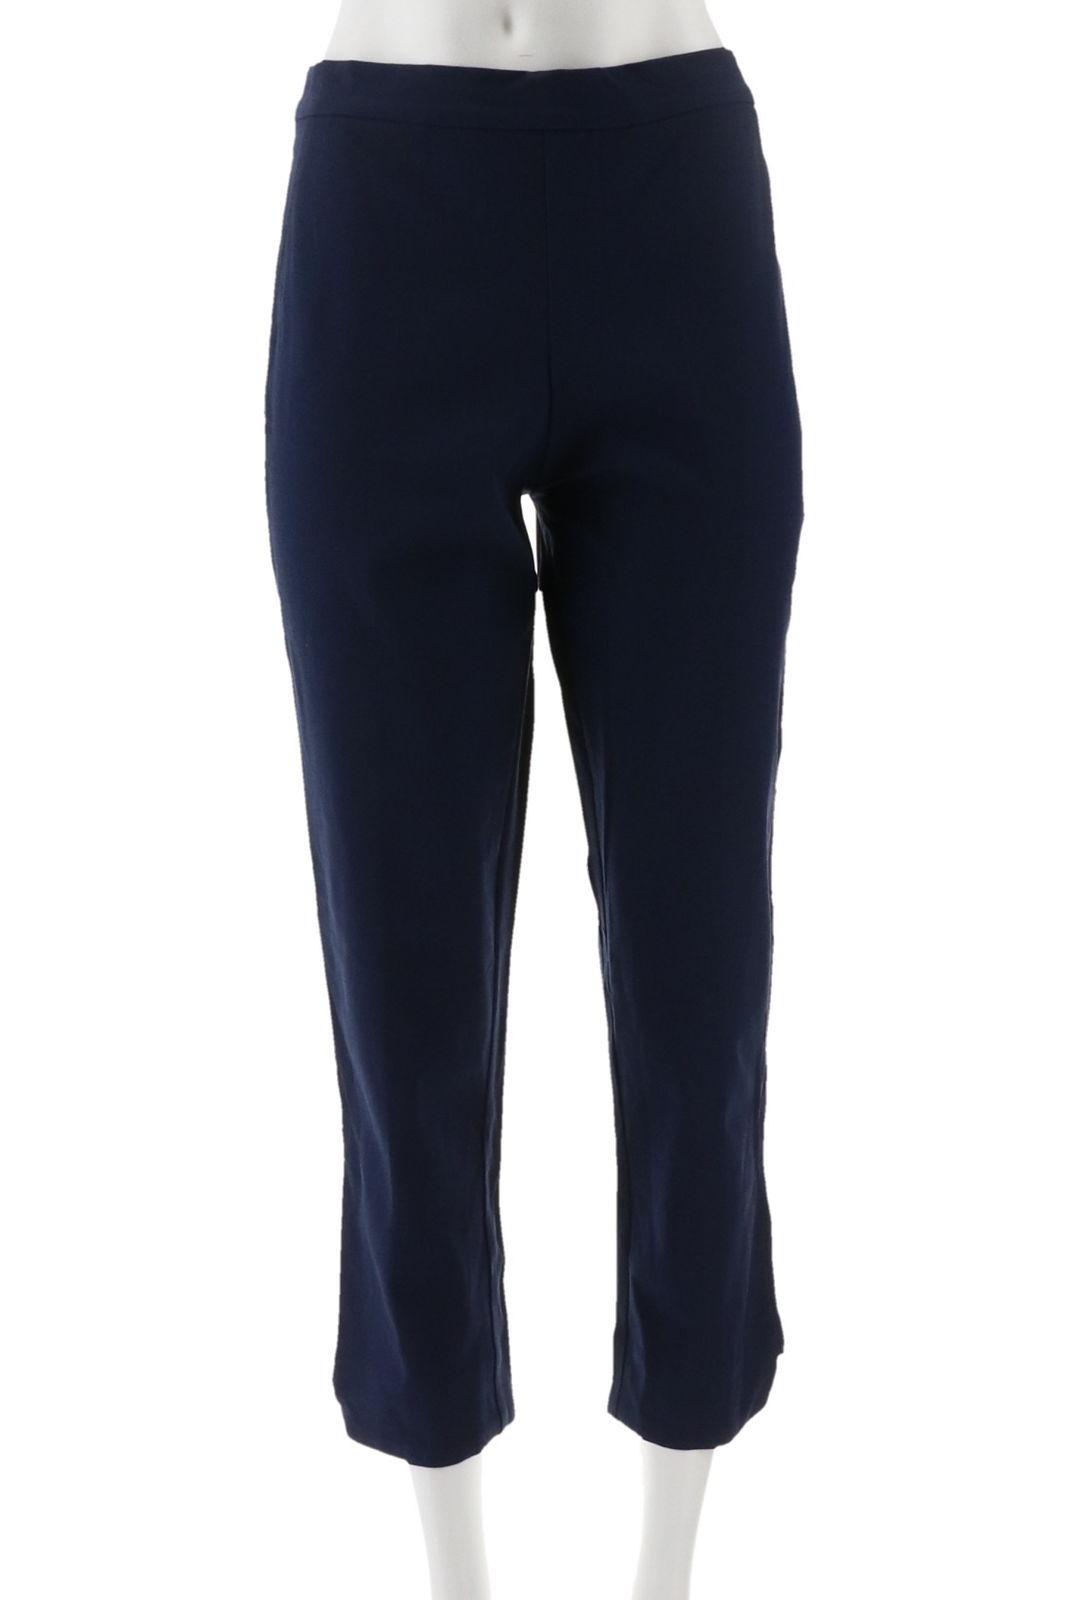 Isaac Mizrahi 24//7 Denim 5-Pocket Ankle Jeans Zip Bright White 8P NEW A290887